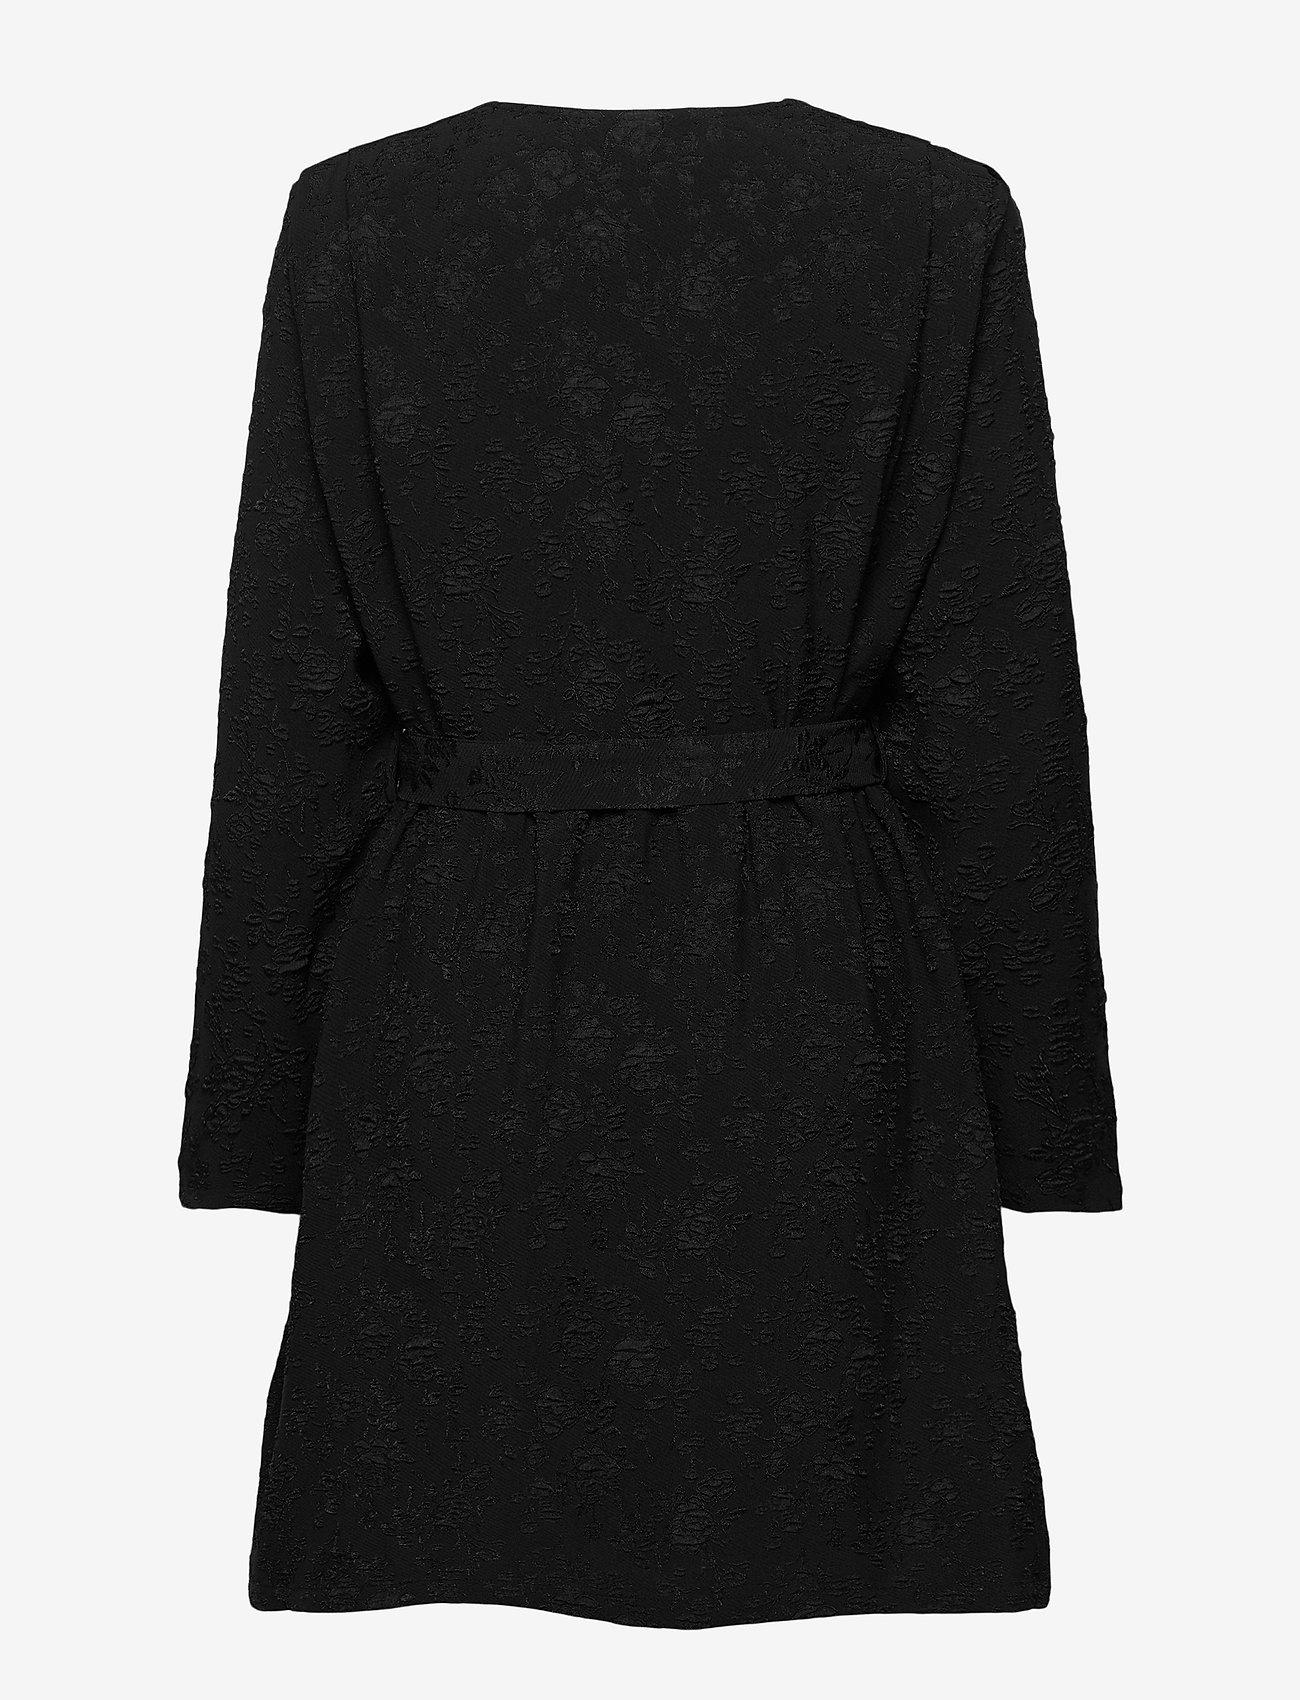 ICHI - IHVIVIANA DR - wrap dresses - black - 1